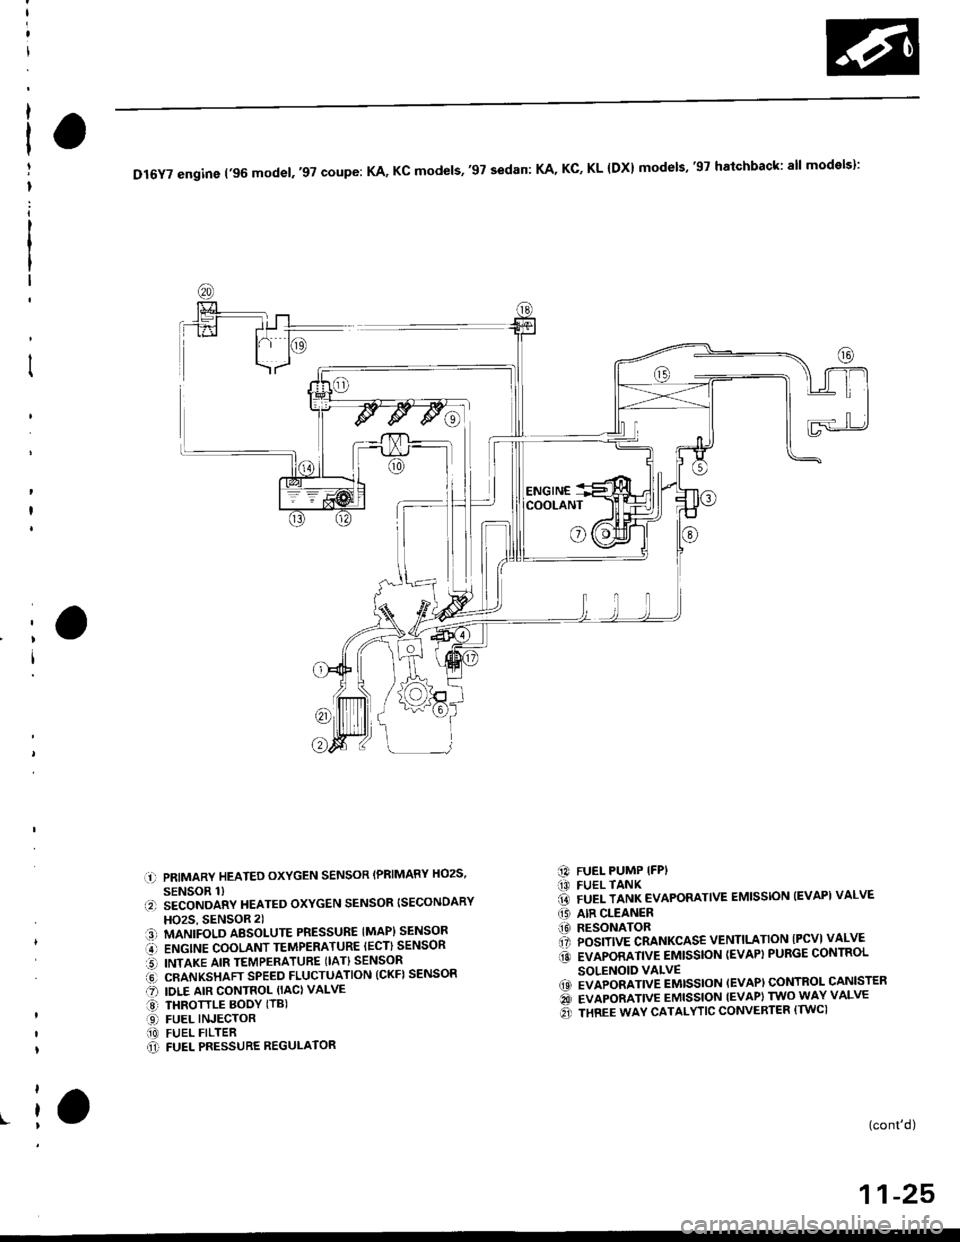 D16y8 Vacuum Hose Diagram Free Download Wiring Diagram Schematic